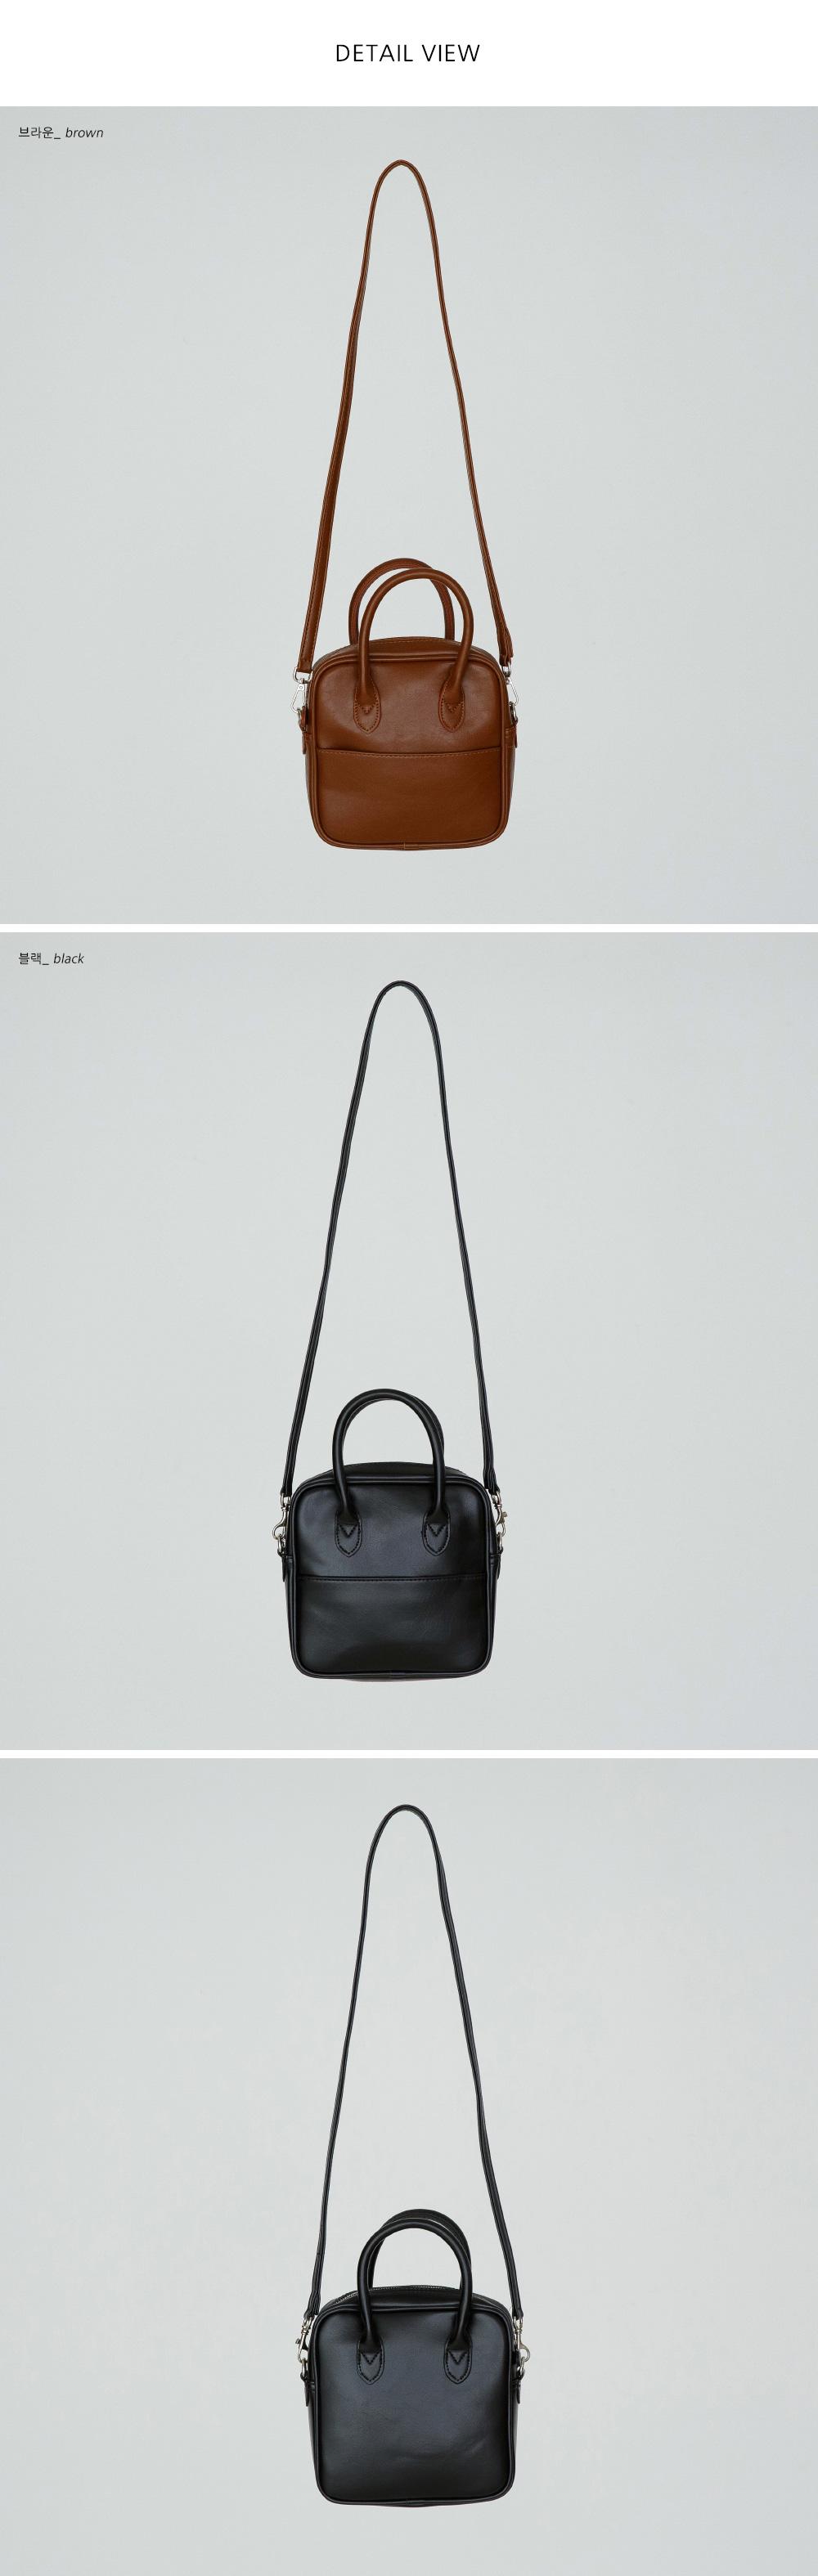 casual square shape bag